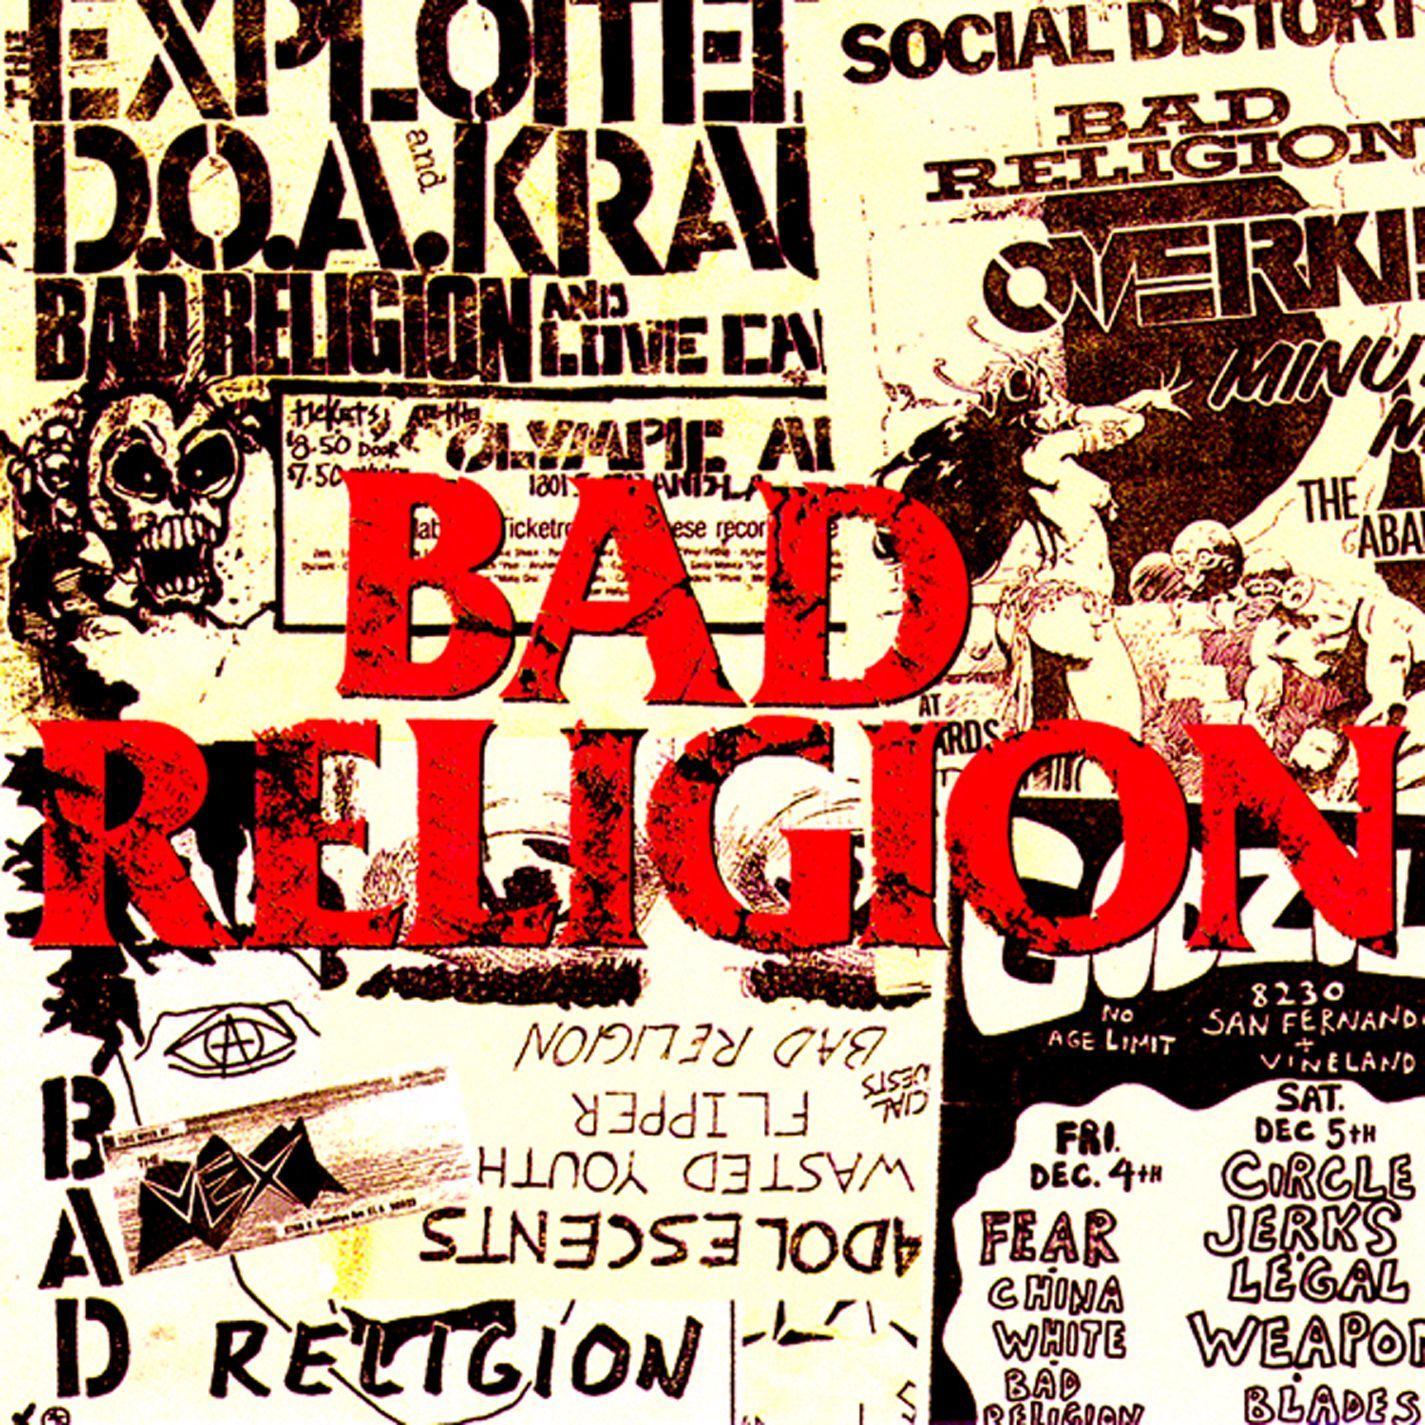 bad religion wallpaper 874 category bad religion image url wallpaper 1425x1425